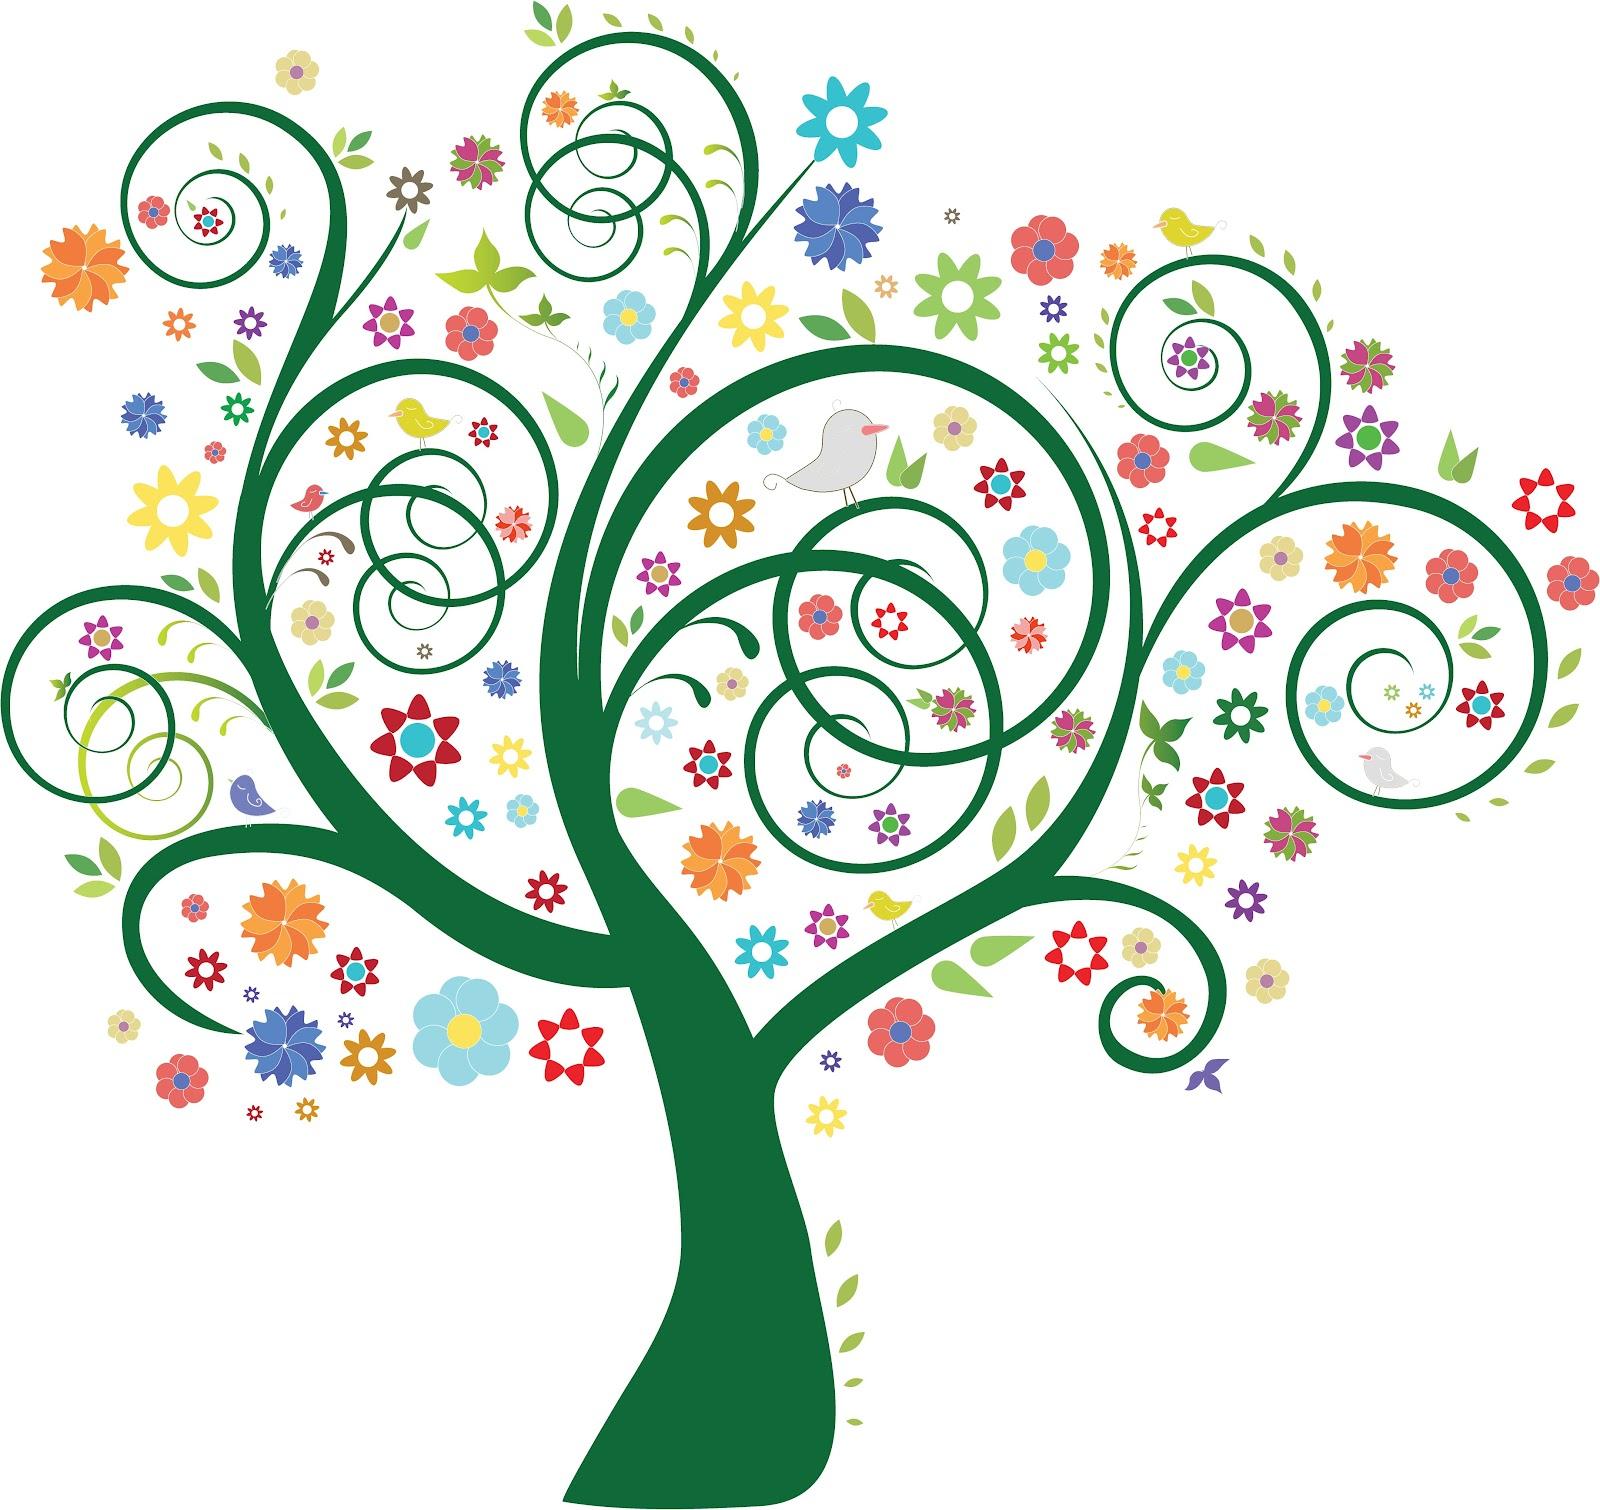 Whimsical Tree Clip Art - ClipArt Best